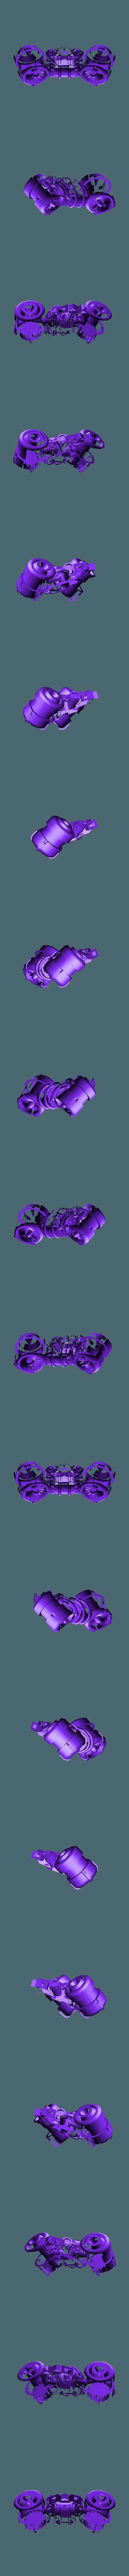 Marine_2_Jet_Pack.stl Download free STL file Assault Marine Builder Berserker, Tzaangors, Blade Cabal • 3D printable template, Mazer